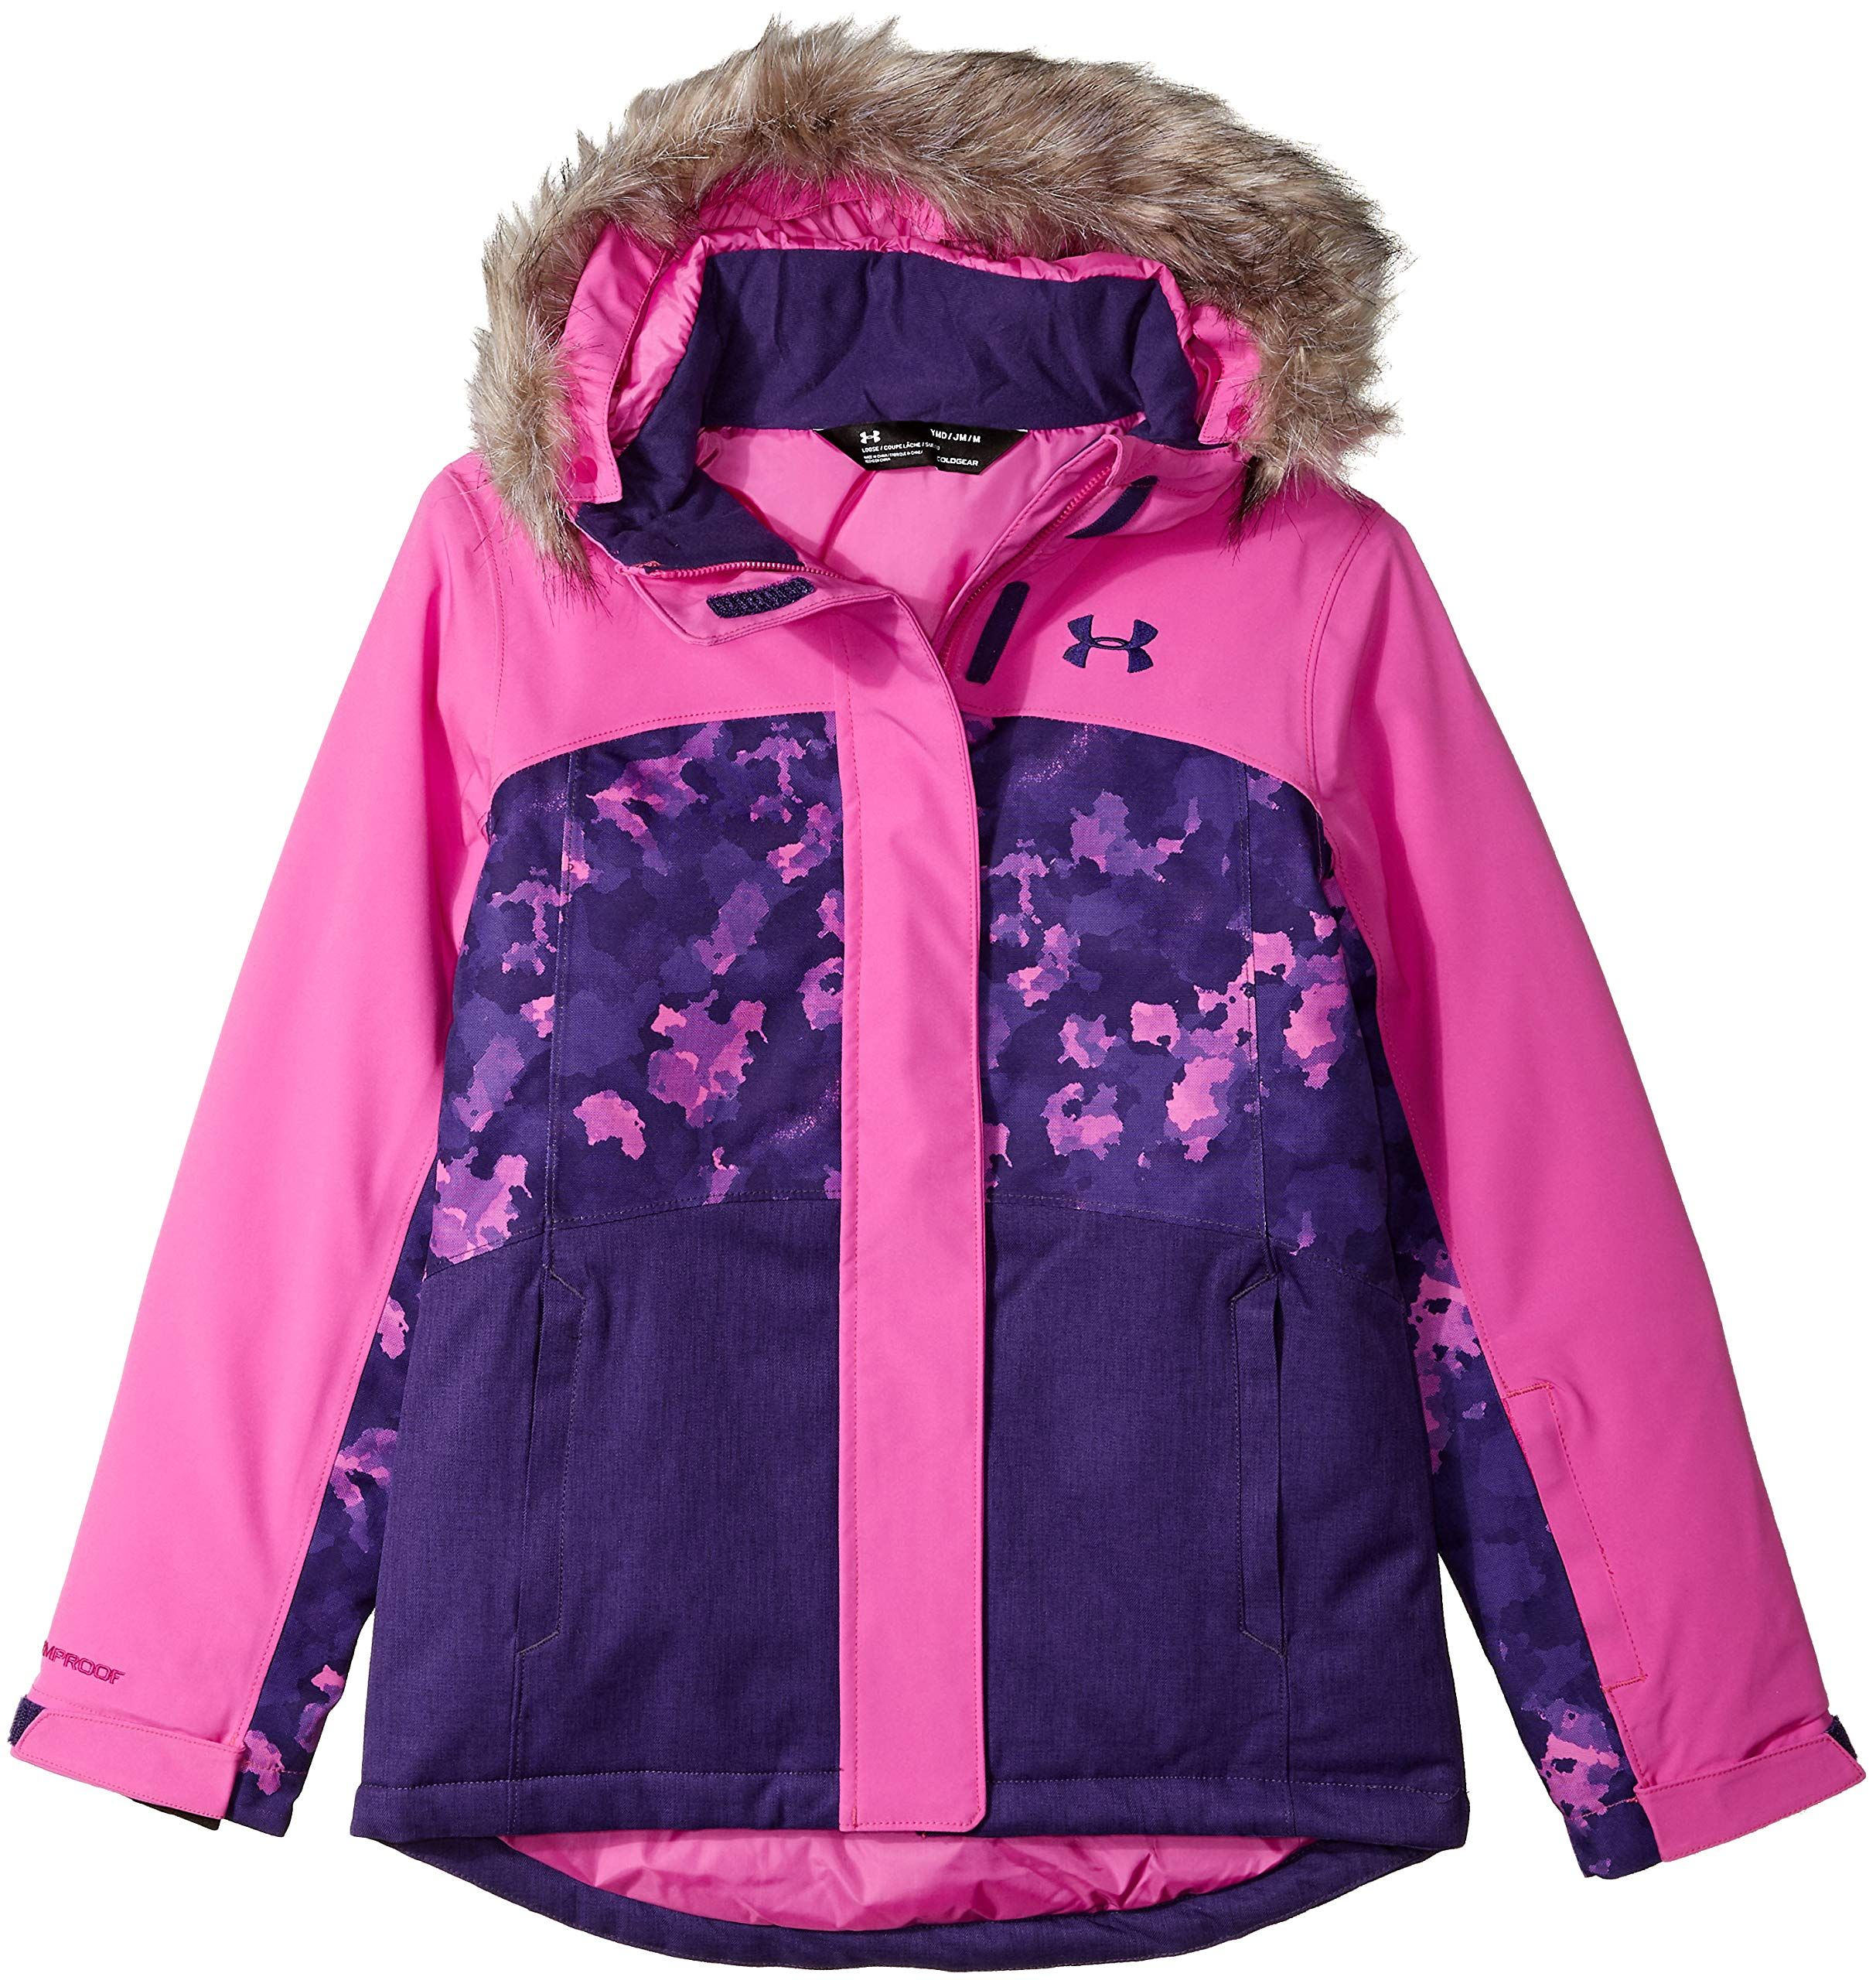 under armour girls jacket